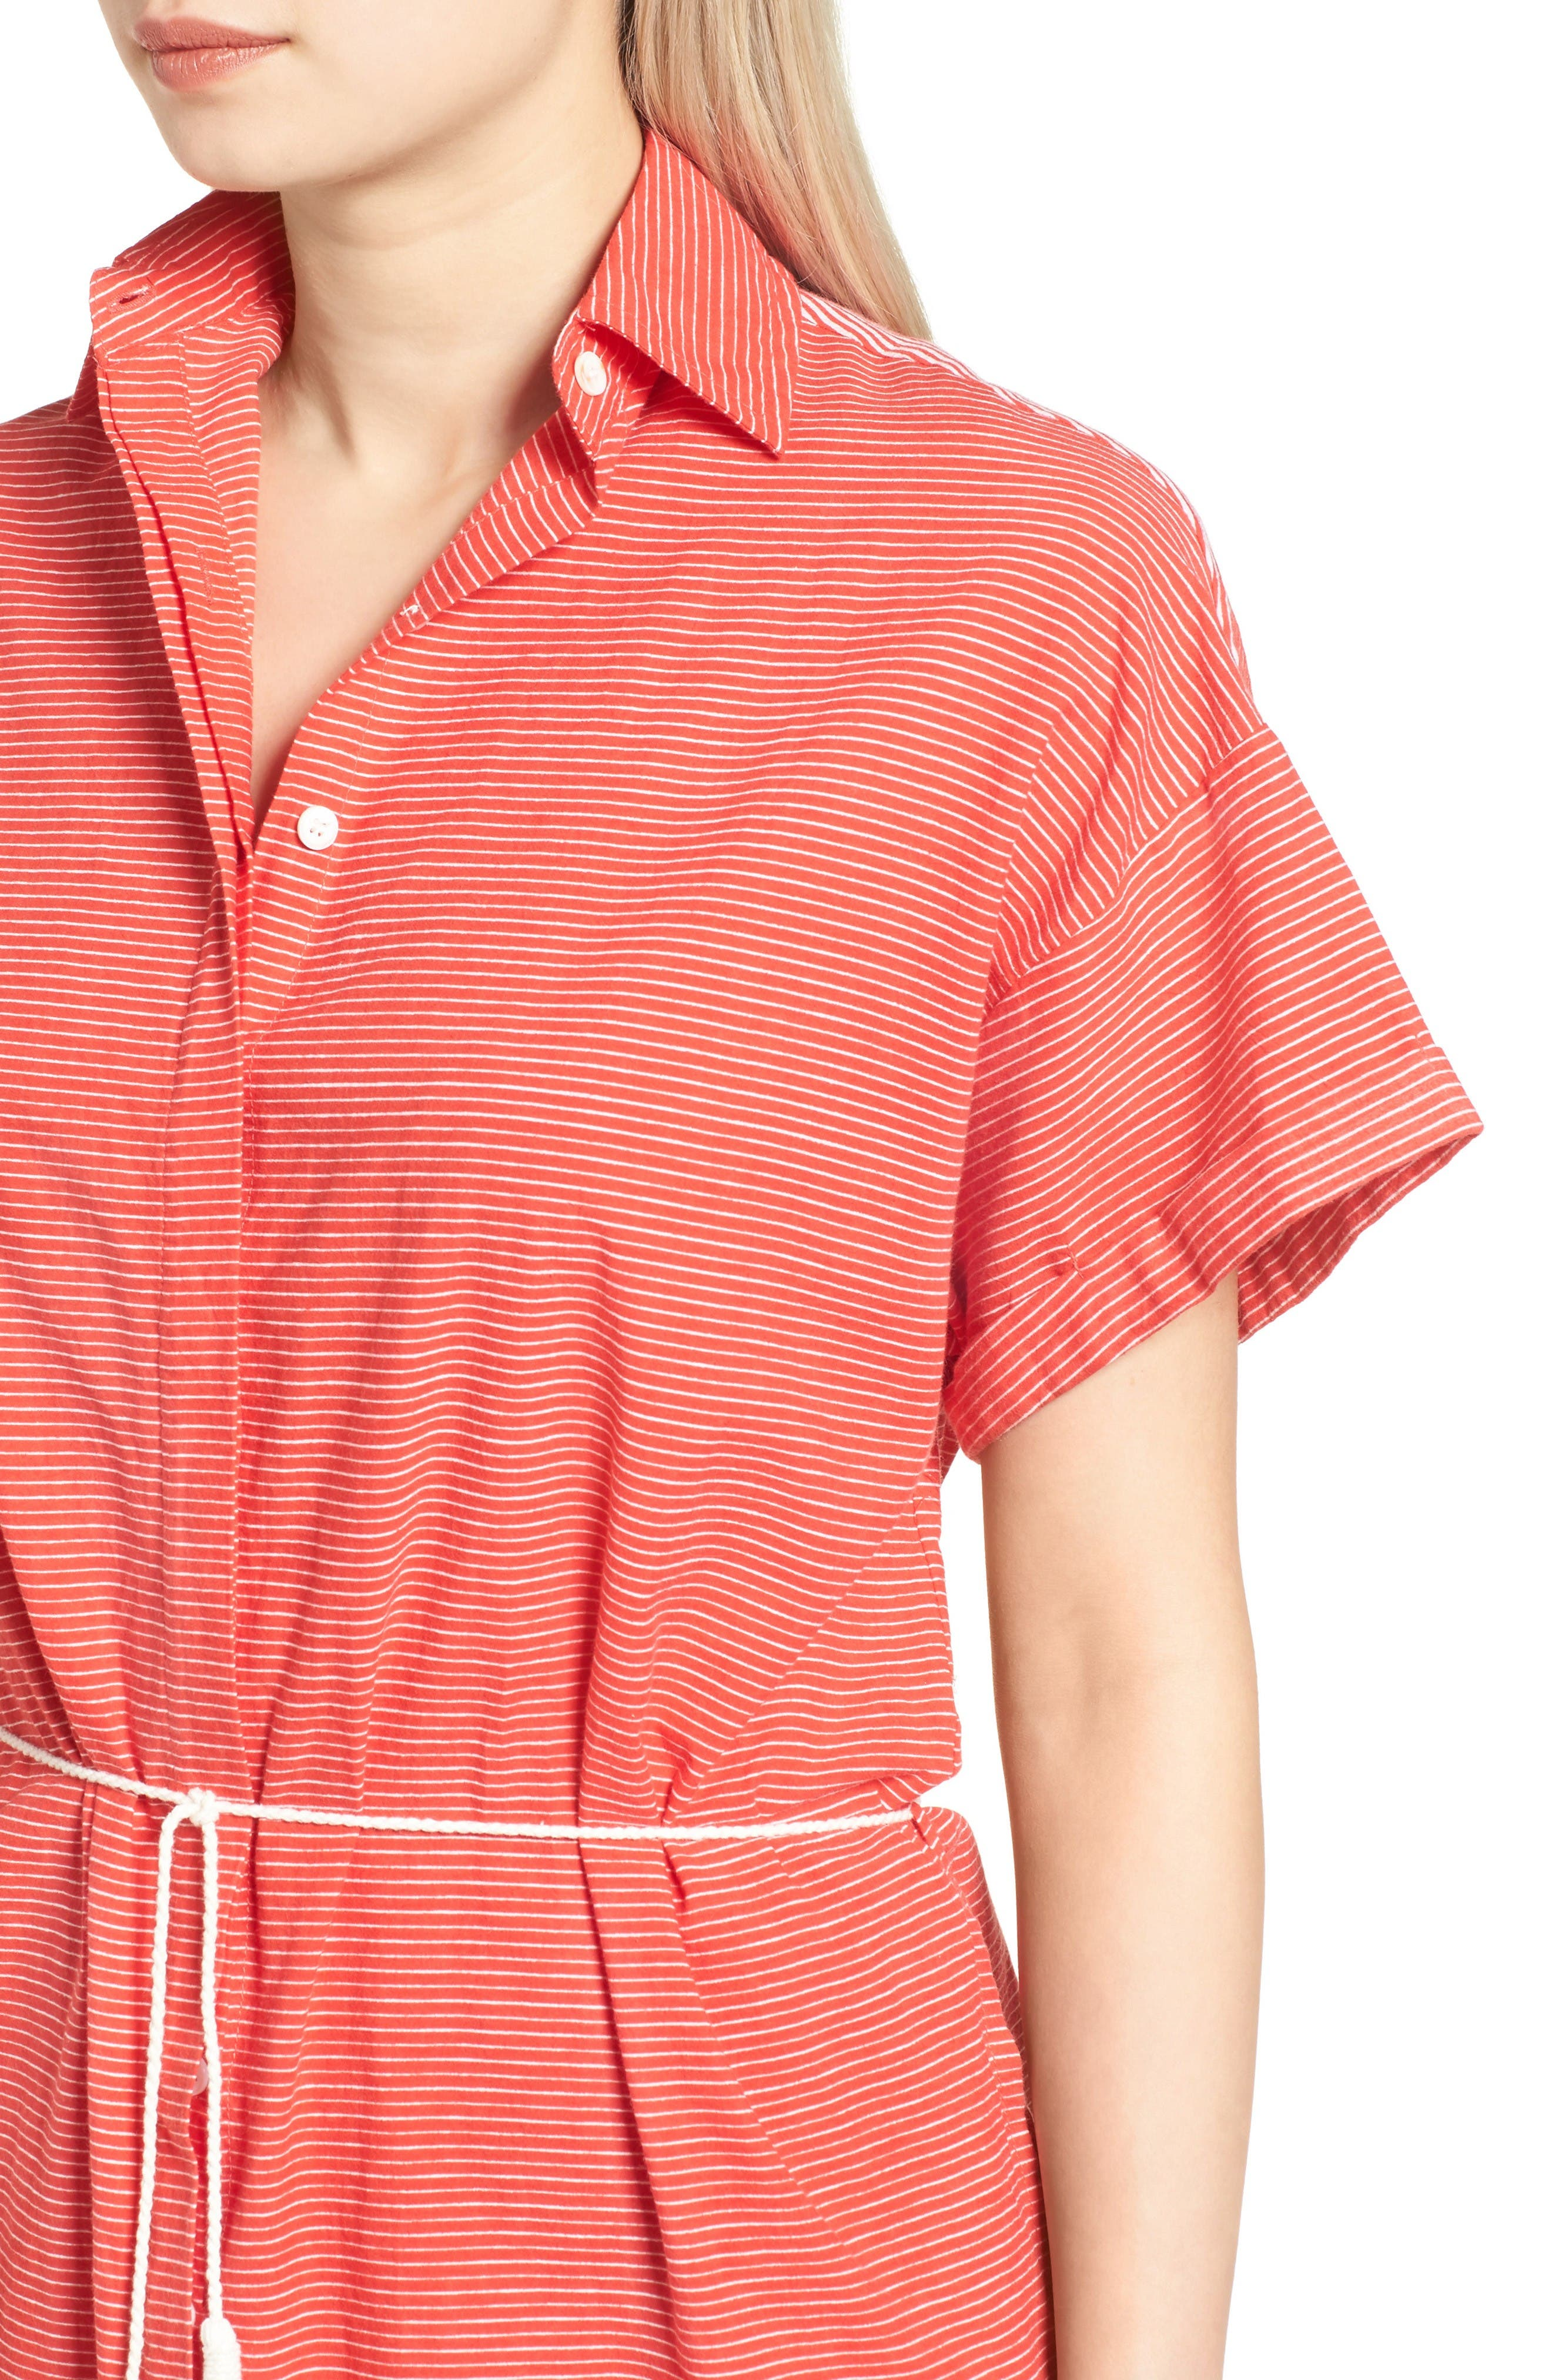 Avalon Cotton Shirtdress,                             Alternate thumbnail 5, color,                             Deep Sea Print Red